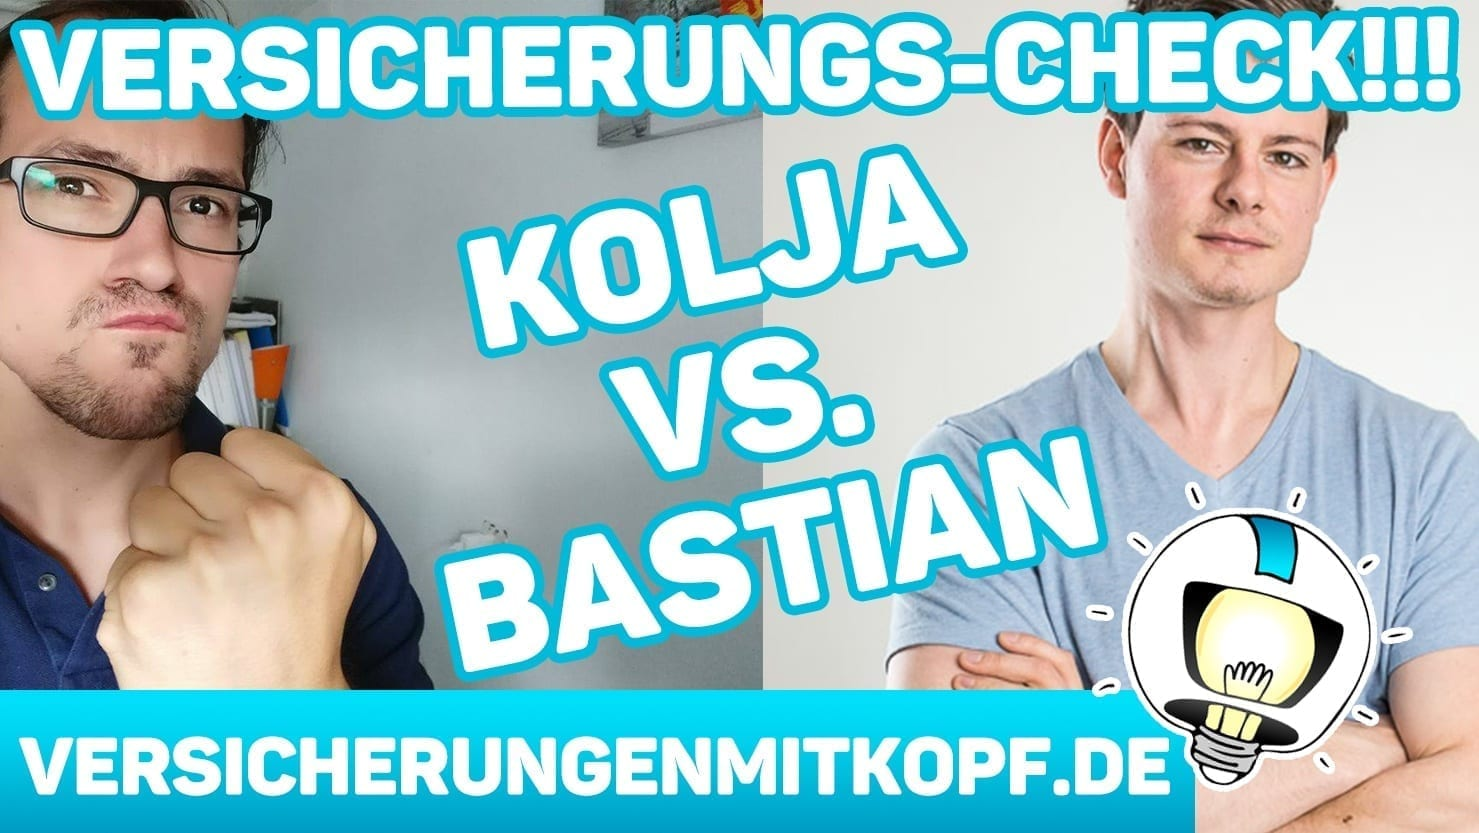 vmk thumbnail Kolja vs Bastian versicherungscheck - Welche Versicherungen haben wir selbst? Kolja vs. Bastian – DER VERSICHERUNGSCHECK